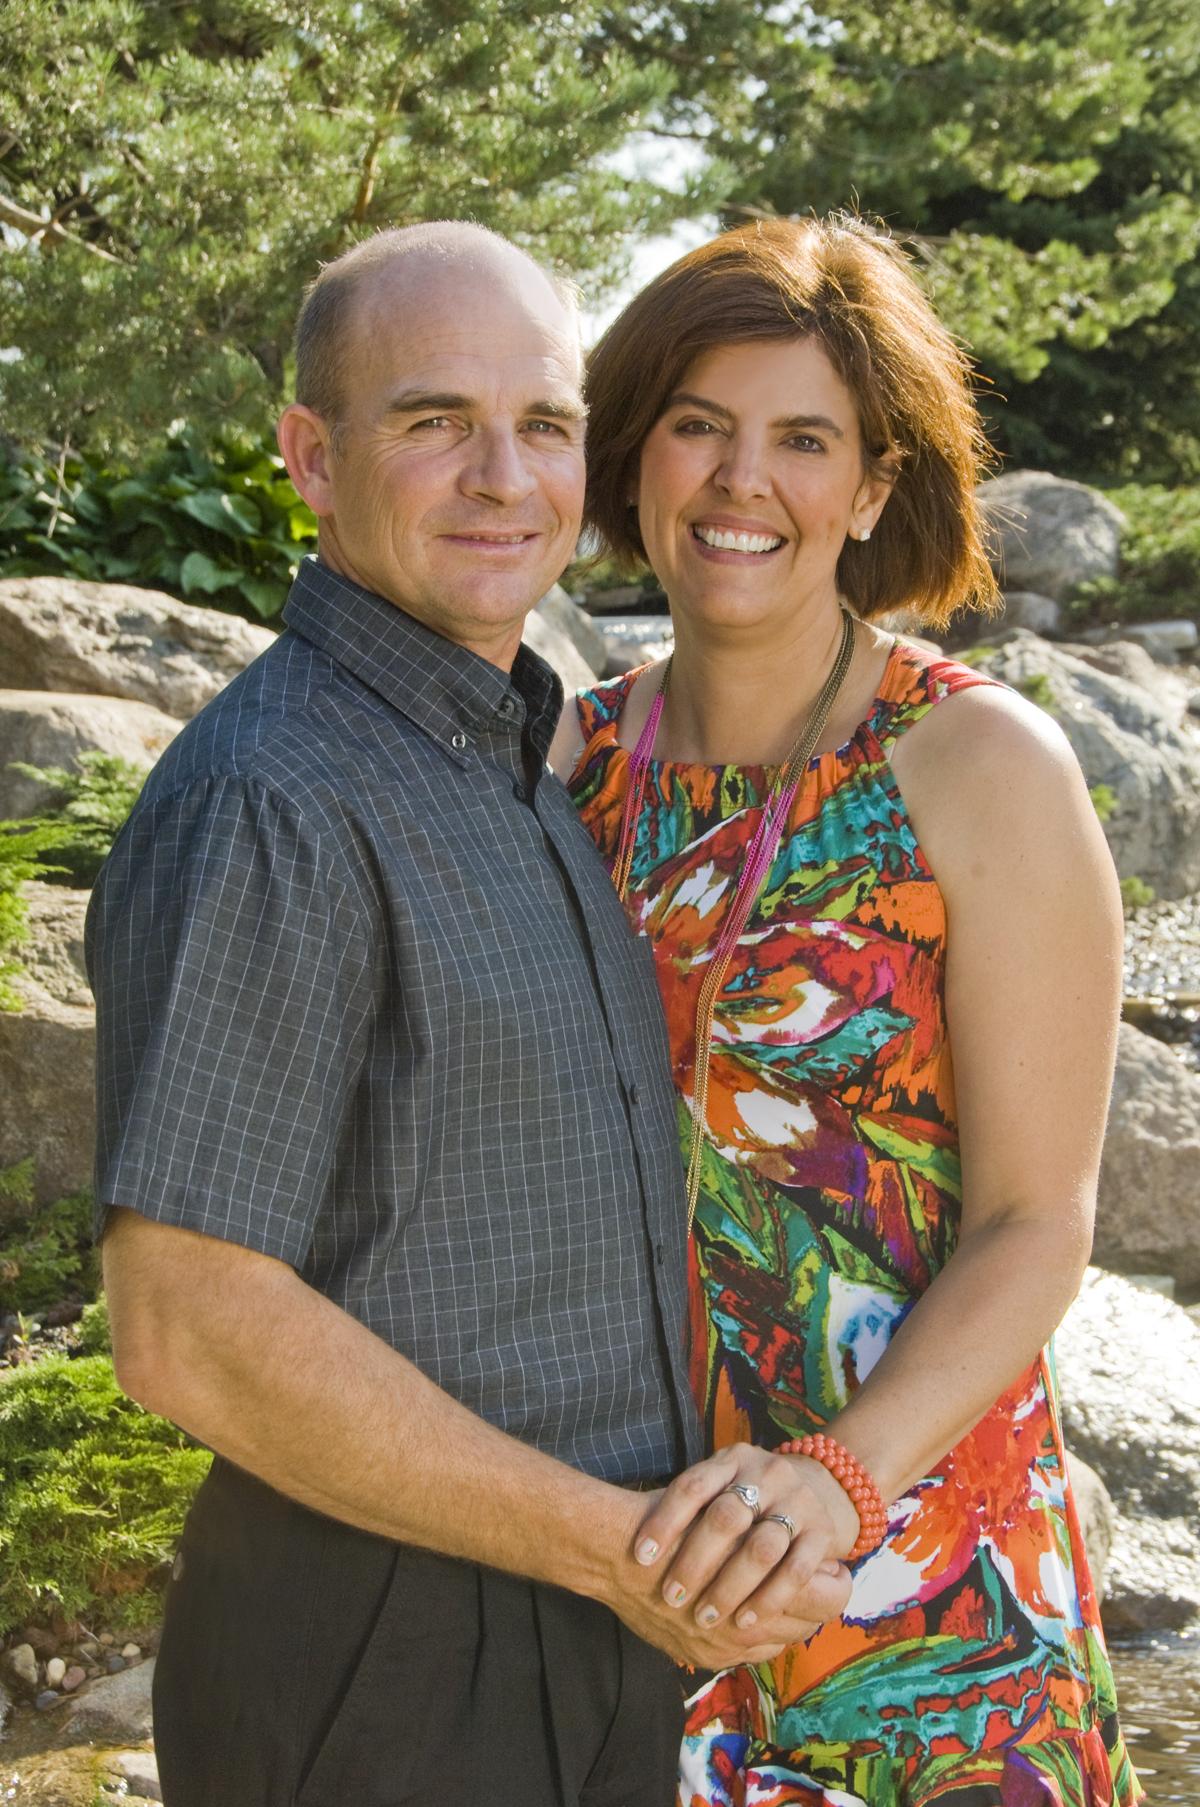 Watertown SD dating matchmaking Palvelut oranssi maakunta CA